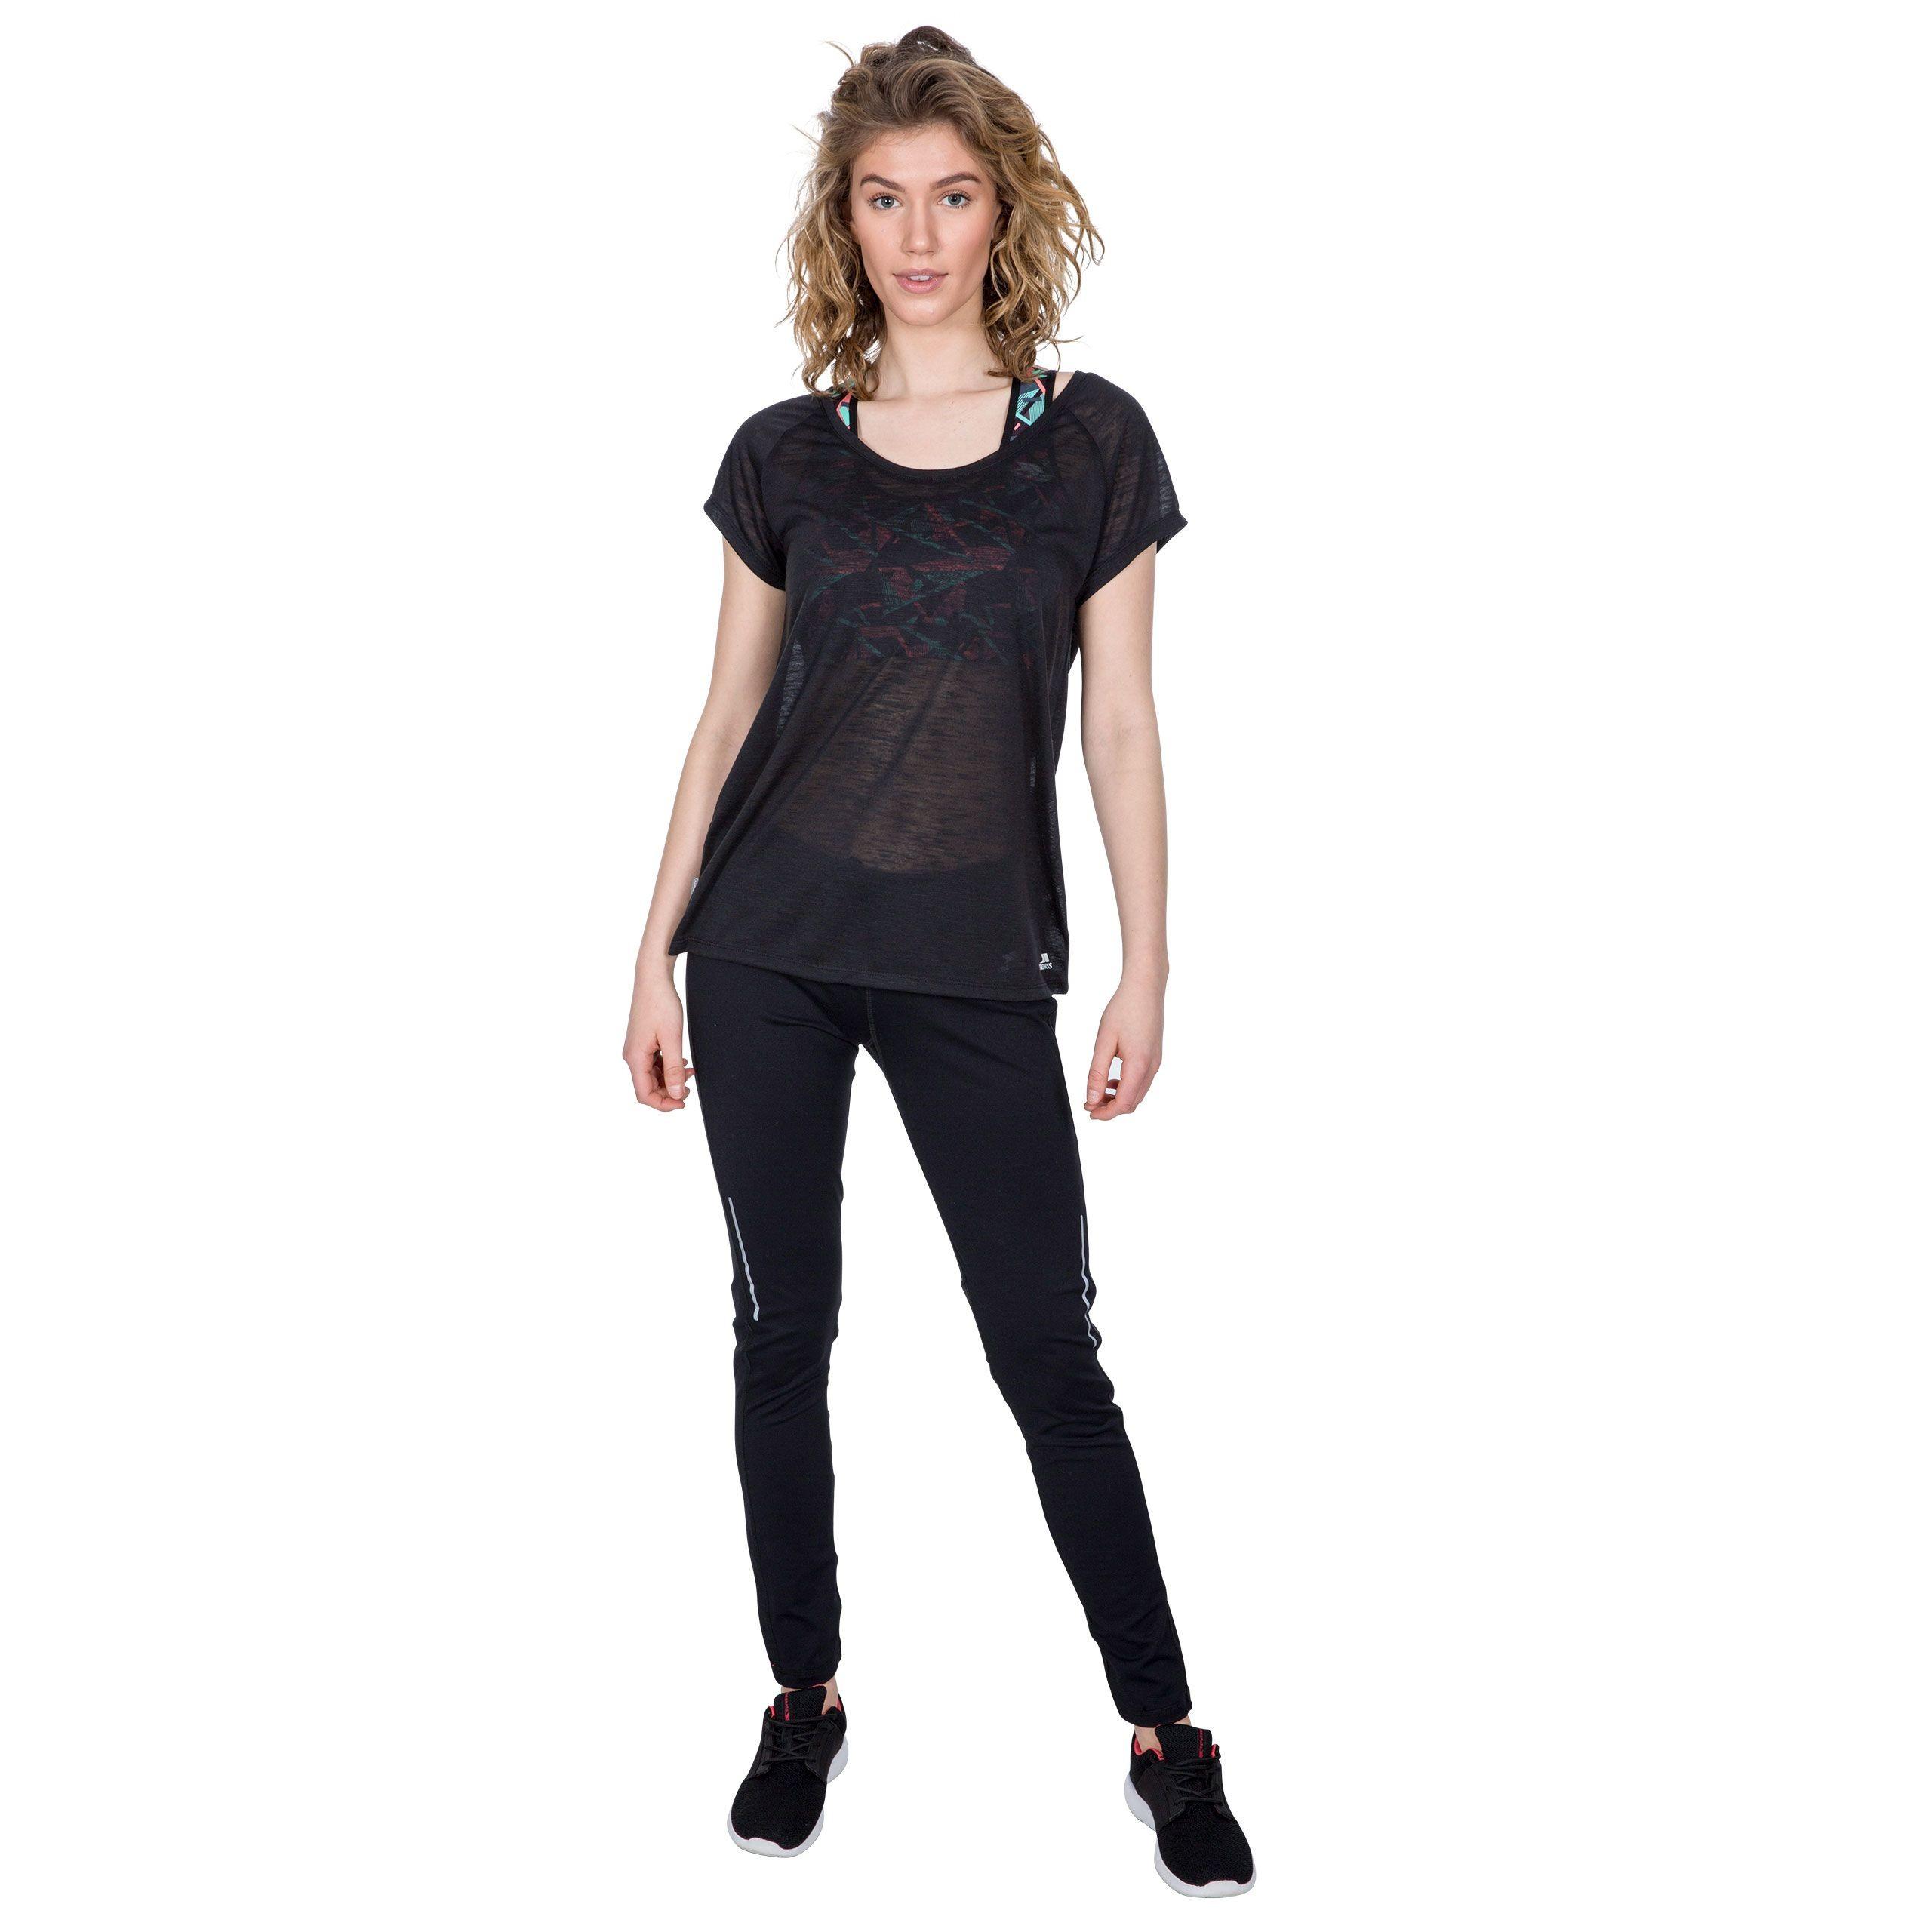 Koszulka treningowa damska NEWBY TP50 TRESPASS Black